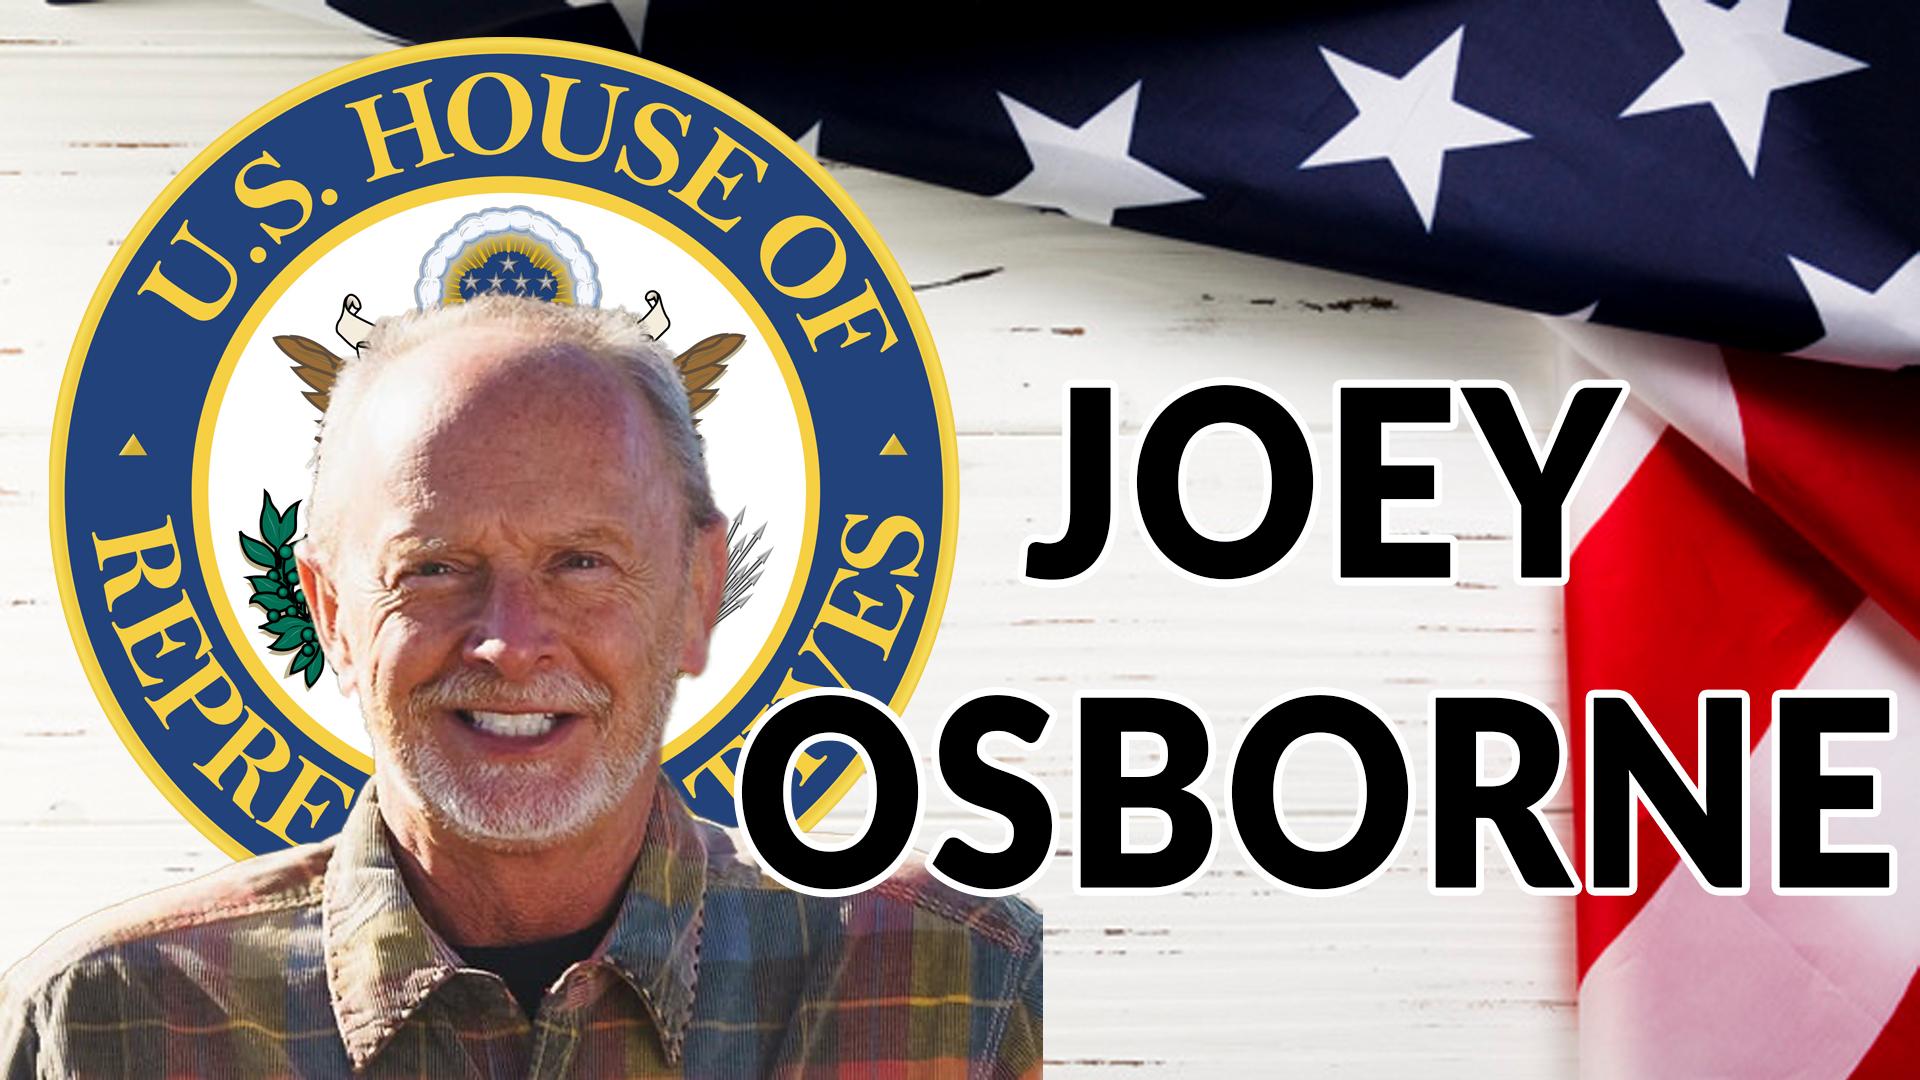 JOEY OSBORNE FOR US HOUSE OF REPRESENTATIVES | AREN 145